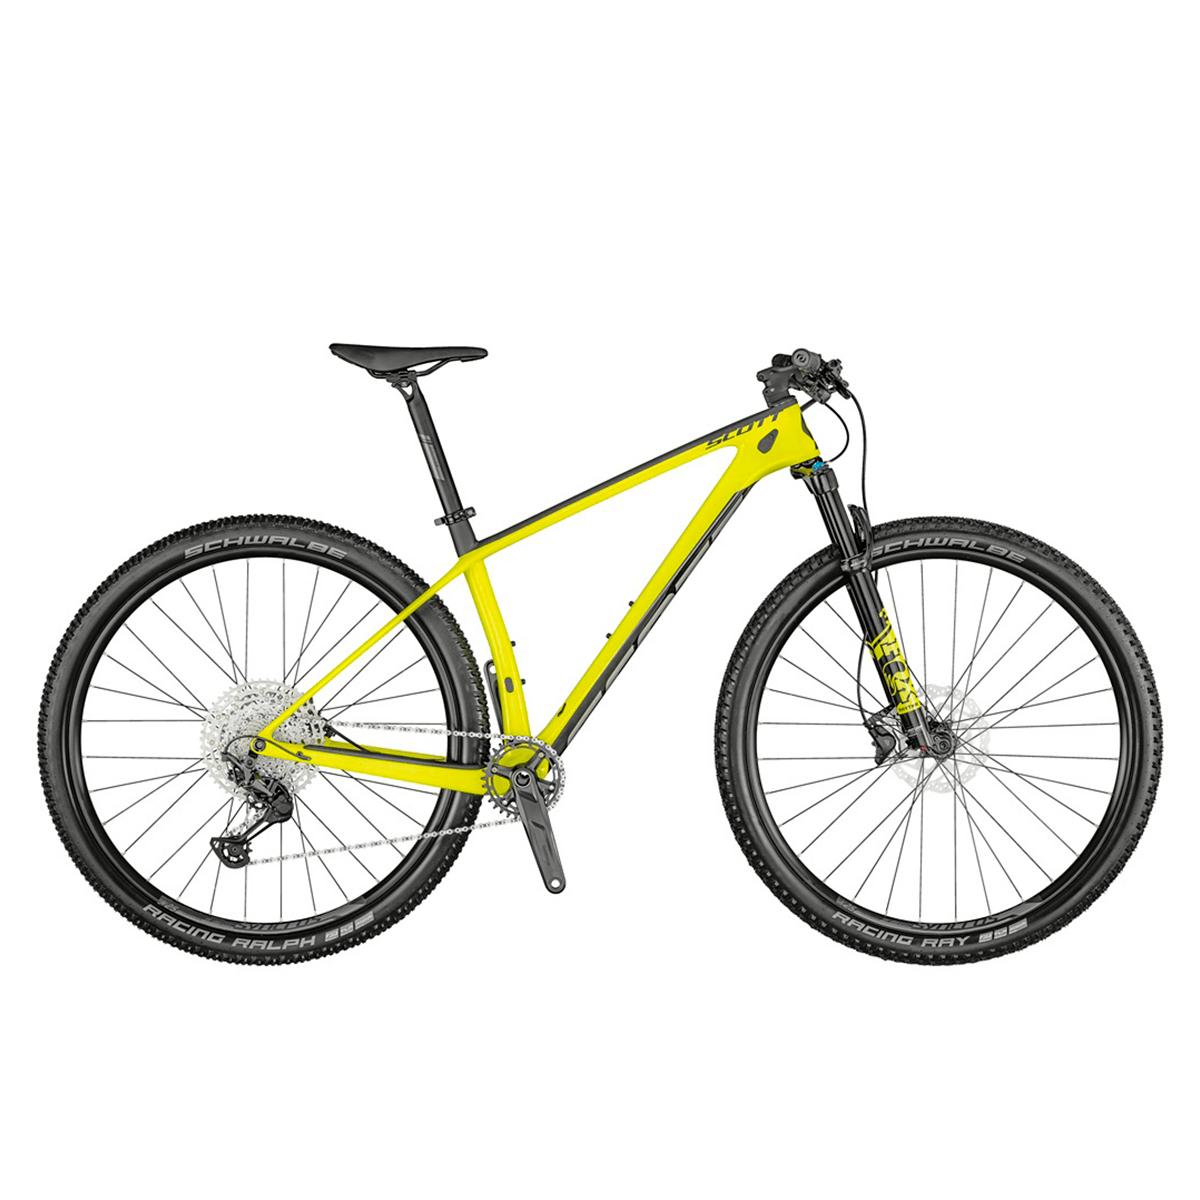 Bicicleta Scott Scale 930 Carbon 2021